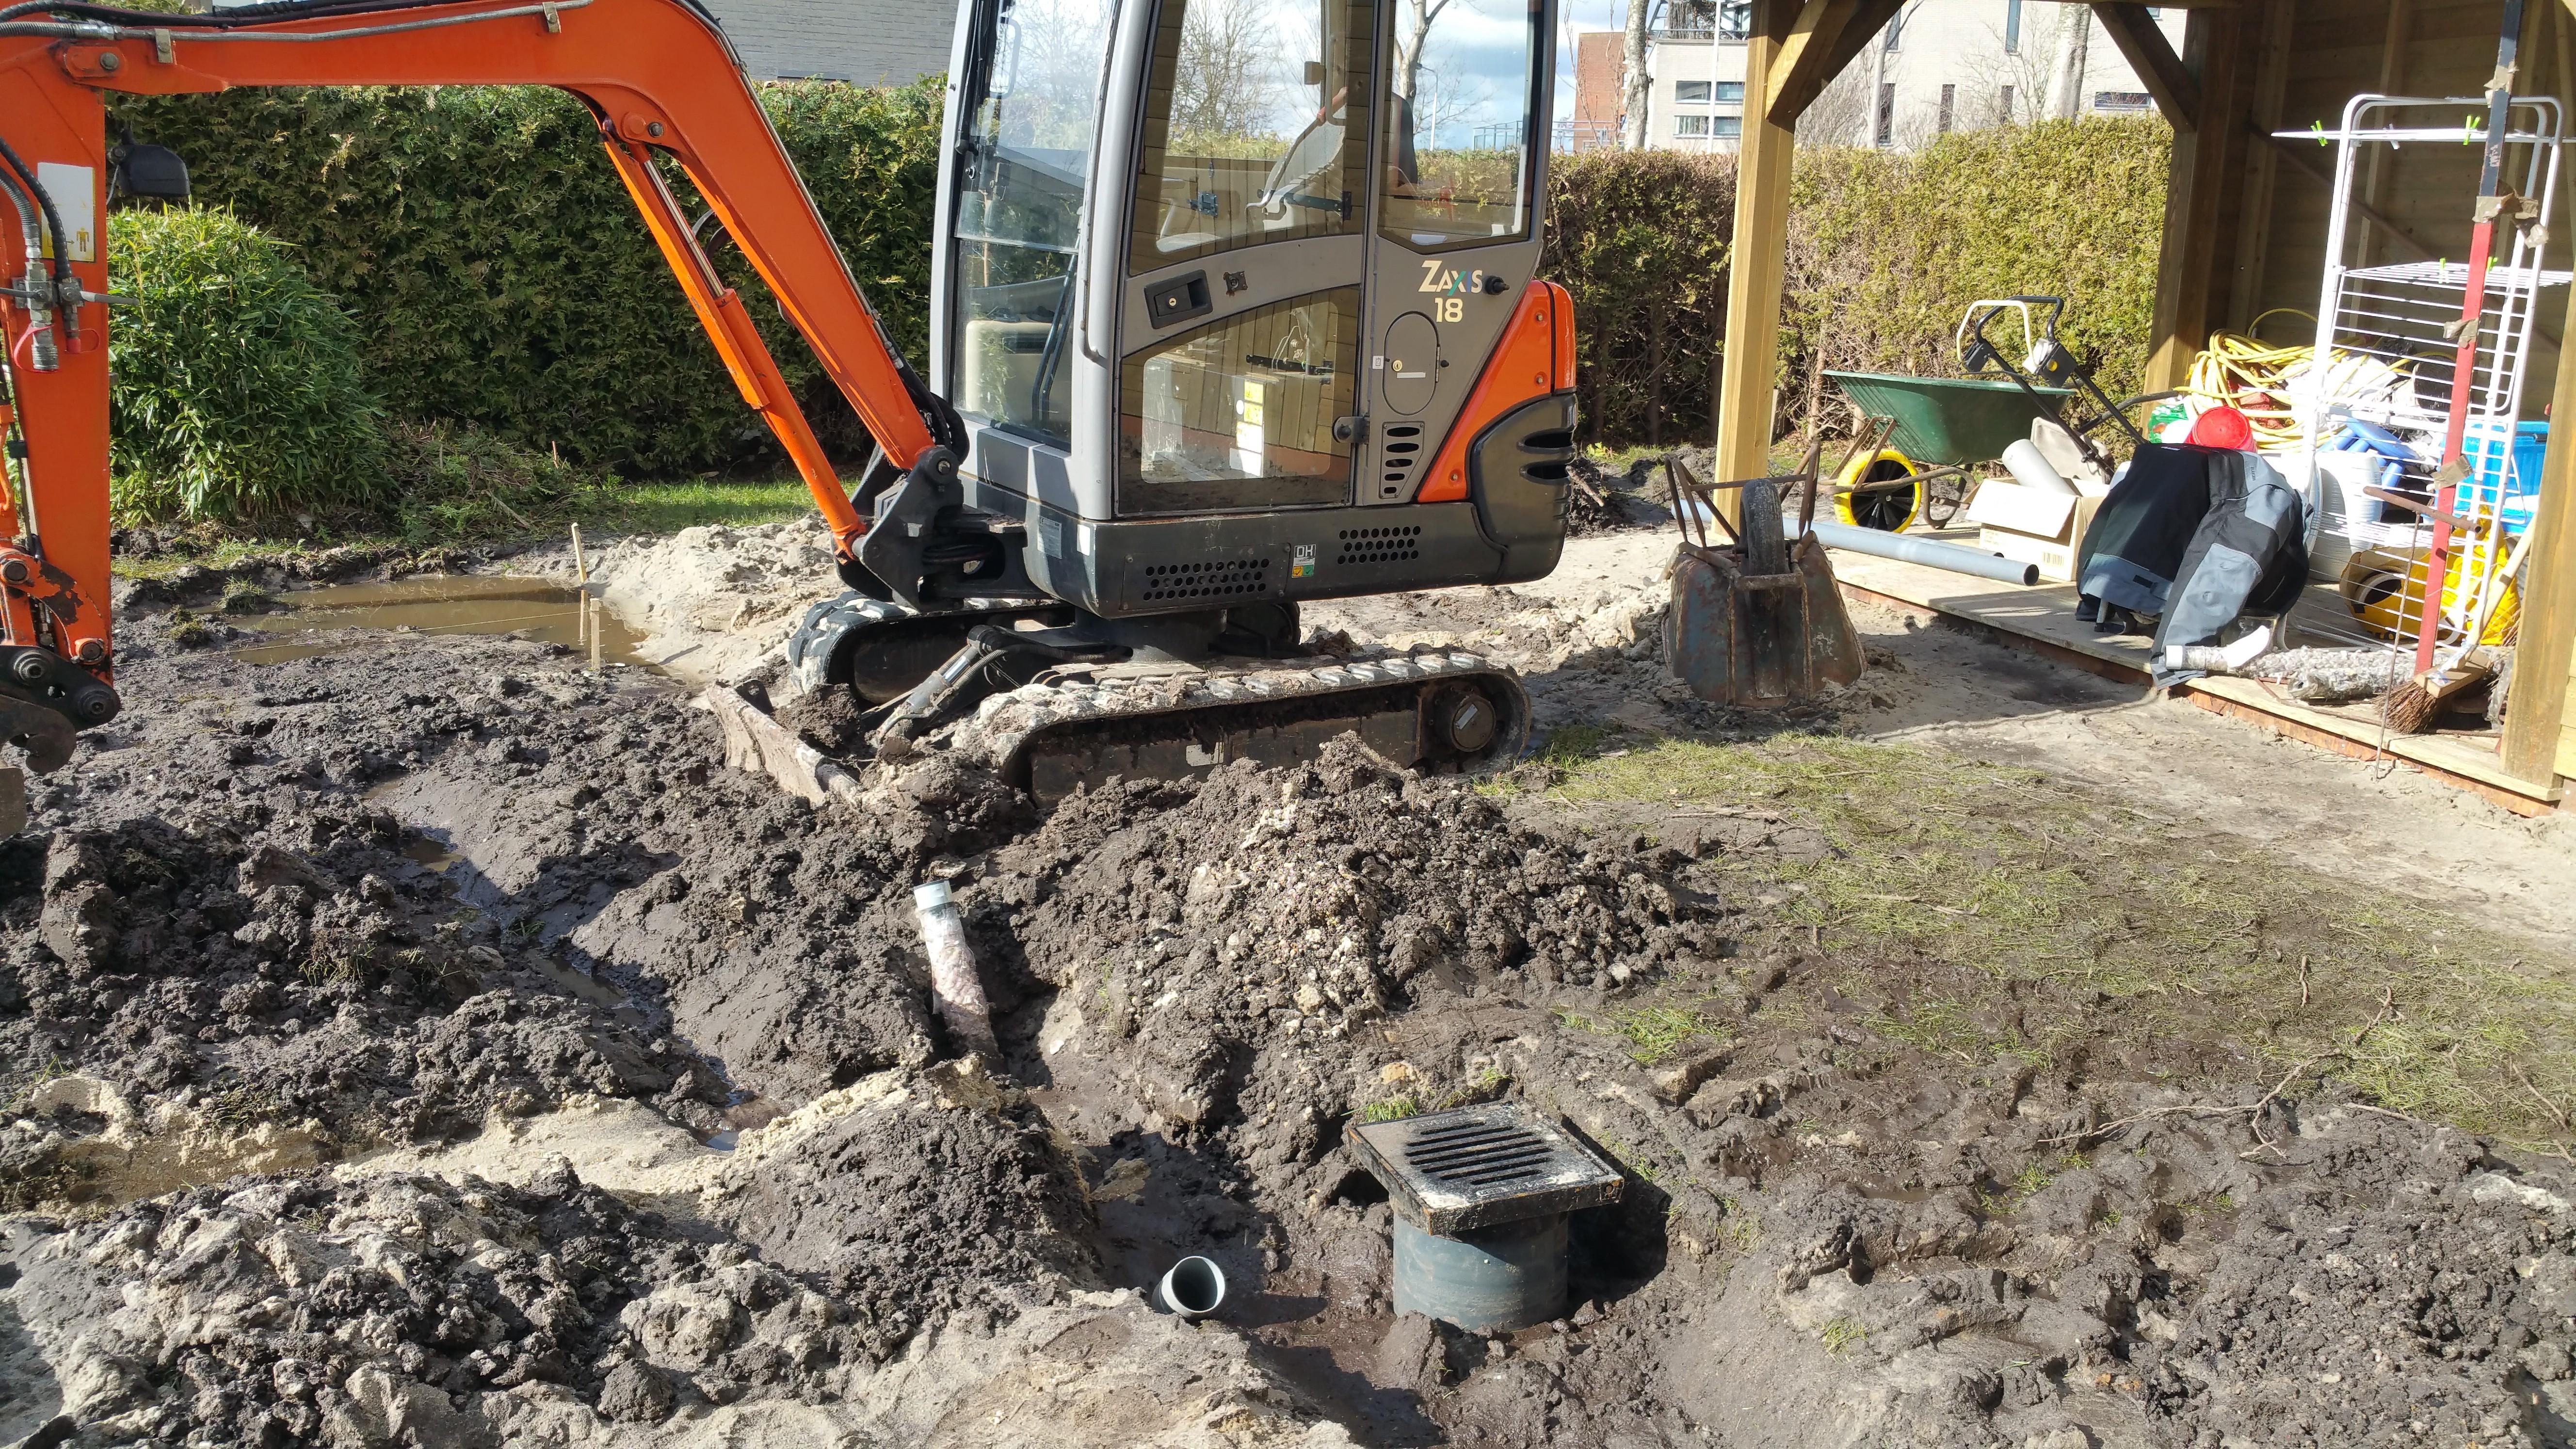 Aanleggen riolering en drain